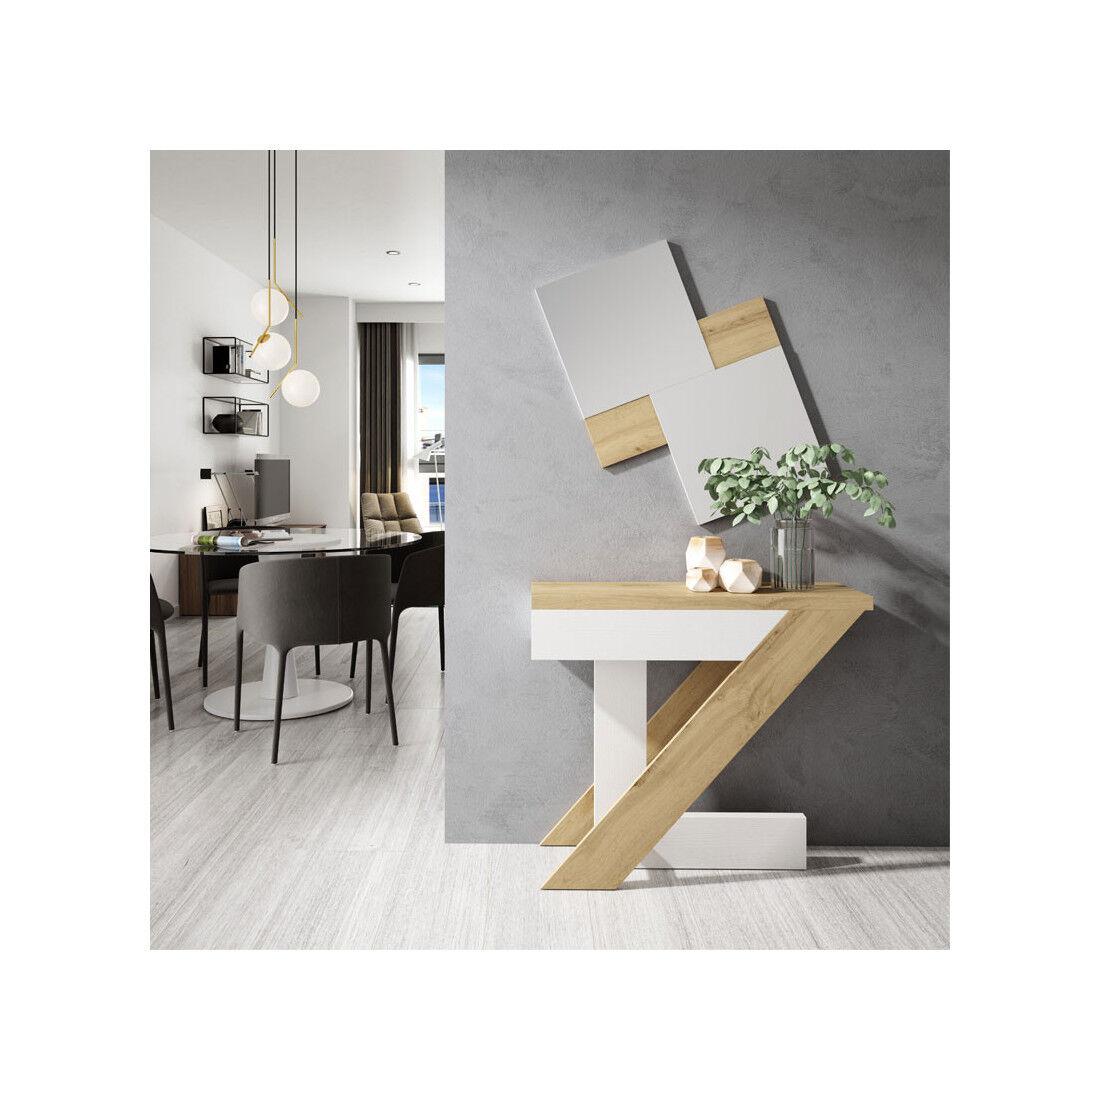 Tousmesmeubles Meuble d'entrée Chêne blond/Bois blanc + miroir - LONELY - L 87.5 x l 29 x H 75.6